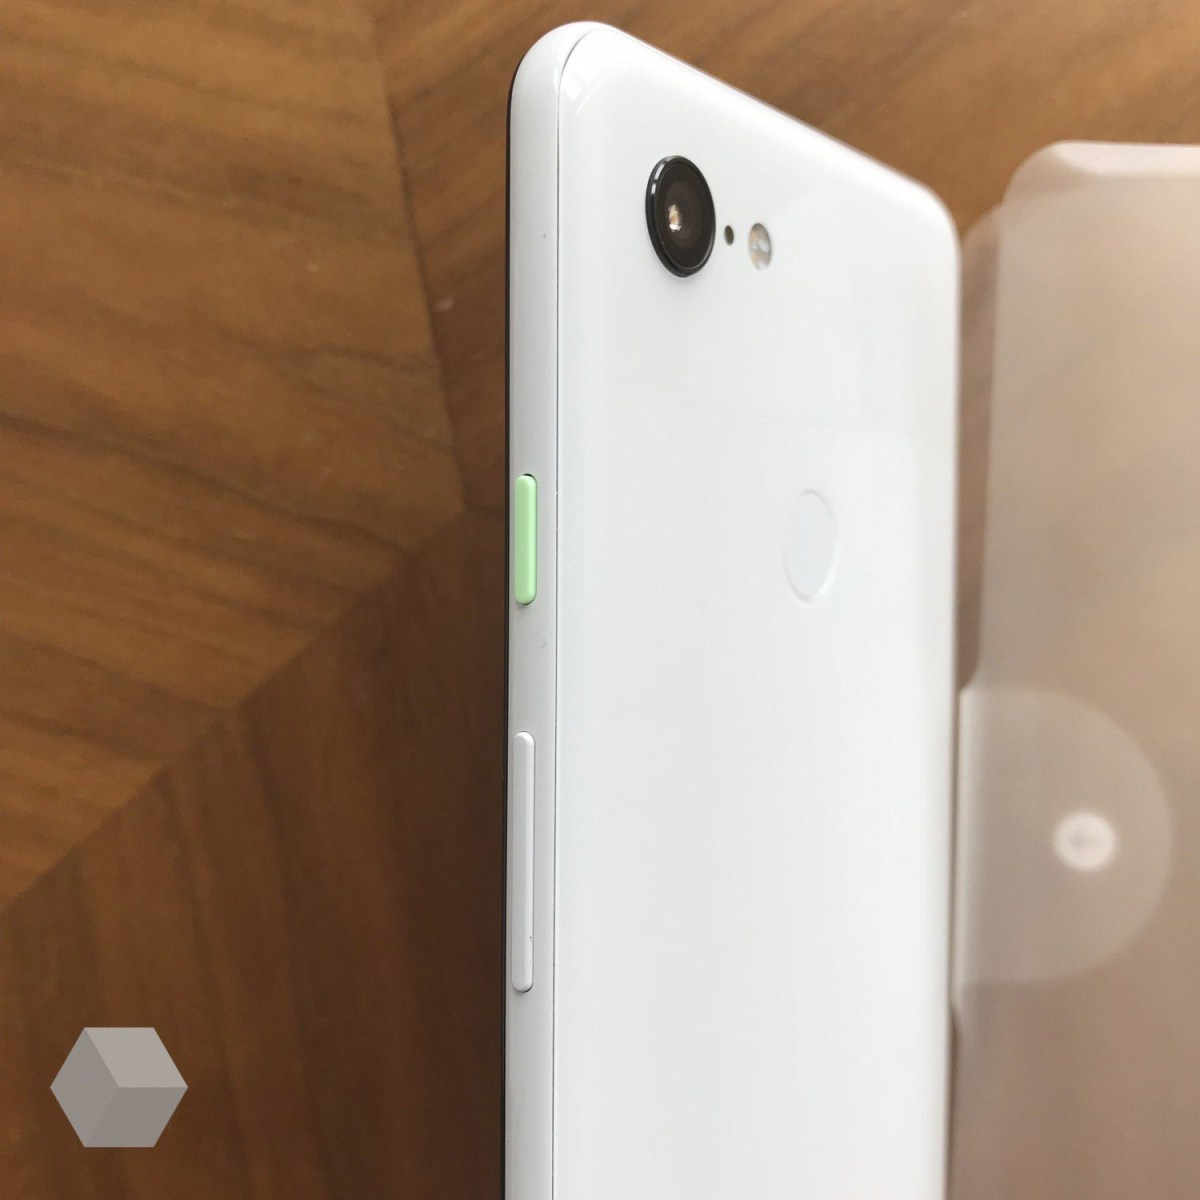 Lateral-Google-Pixel-3-XL.jpg